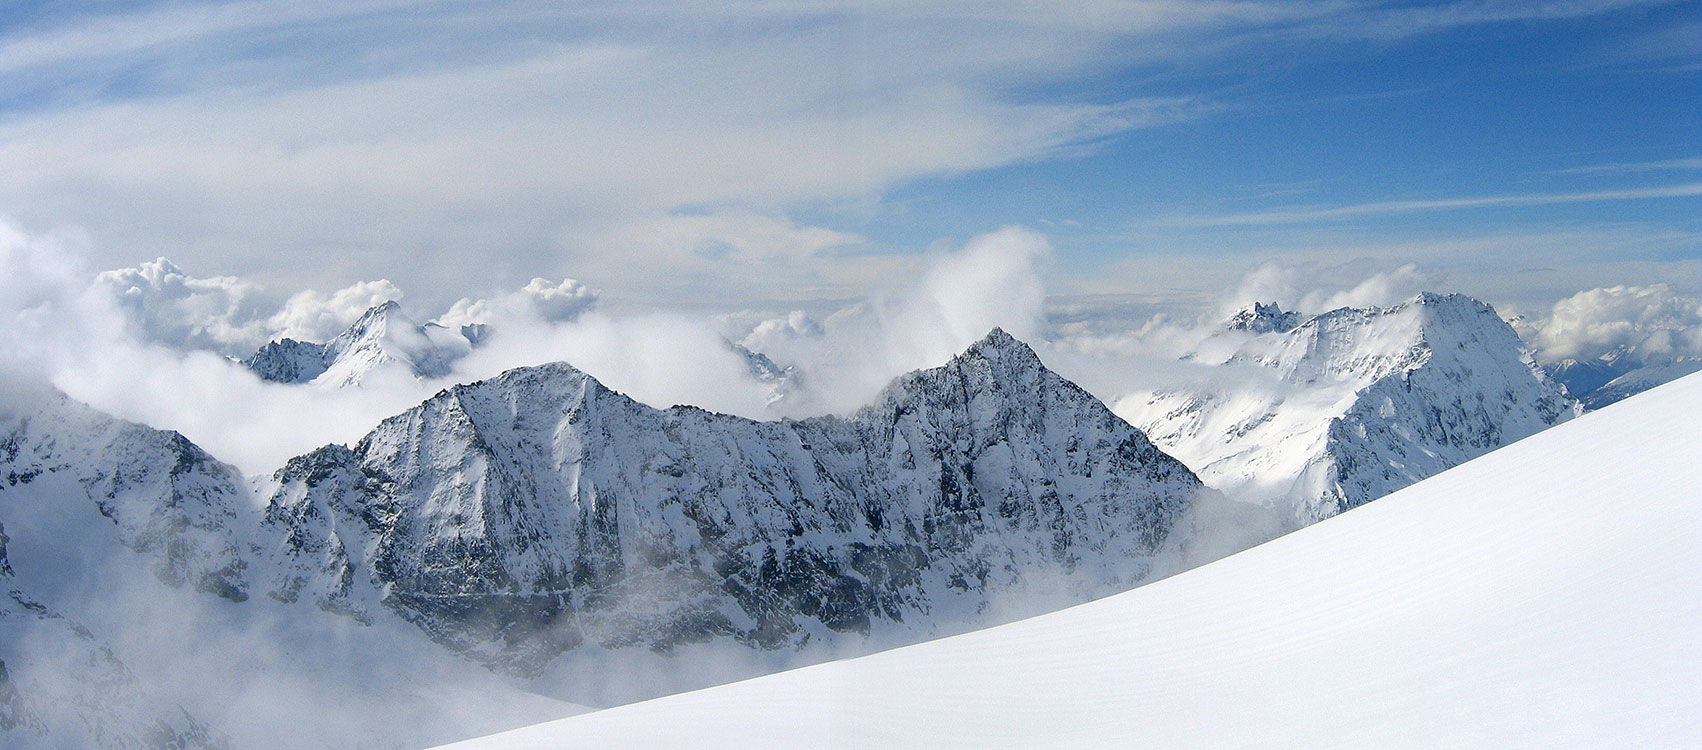 La Ruinette Walliser Alpen / Alpes valaisannes Švýcarsko panorama 35